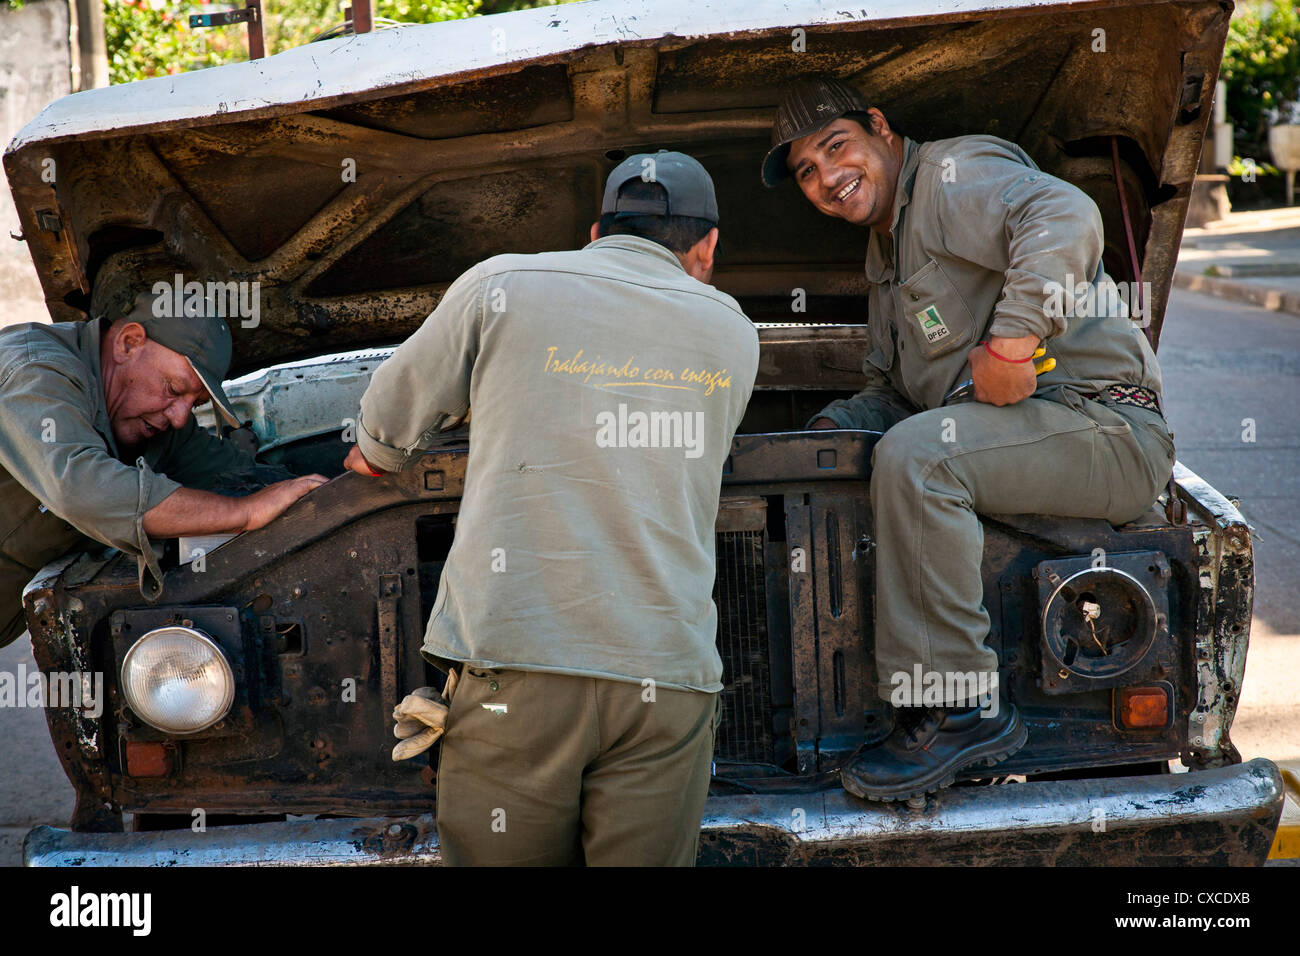 Kfz-Mechaniker, Mercedes, Provinz Corrientes, Argentinien. Stockbild